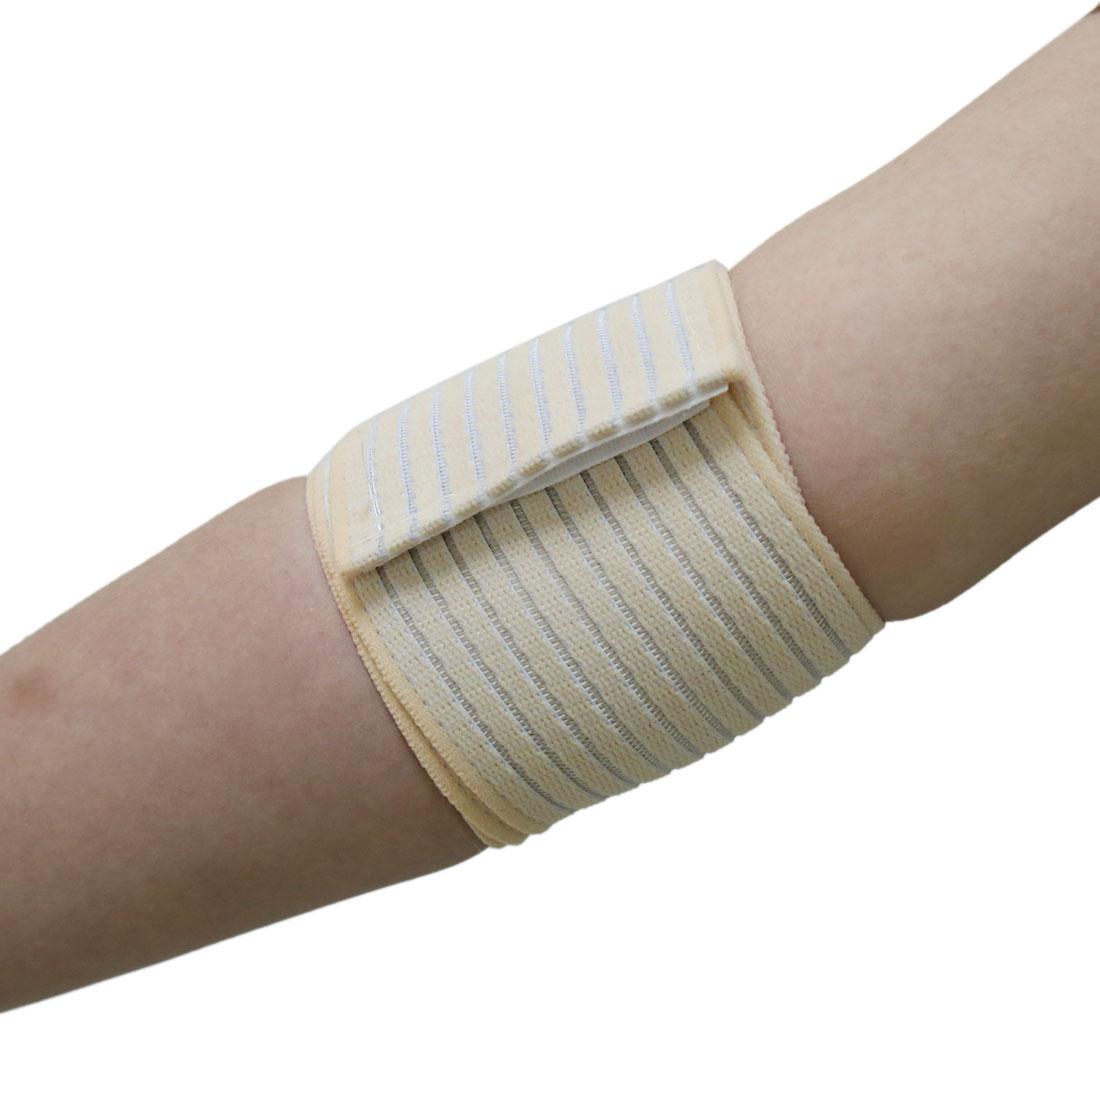 Universal Beige Elastic Elbow Support Wrap Bandage Brace Sprain Joint Protection